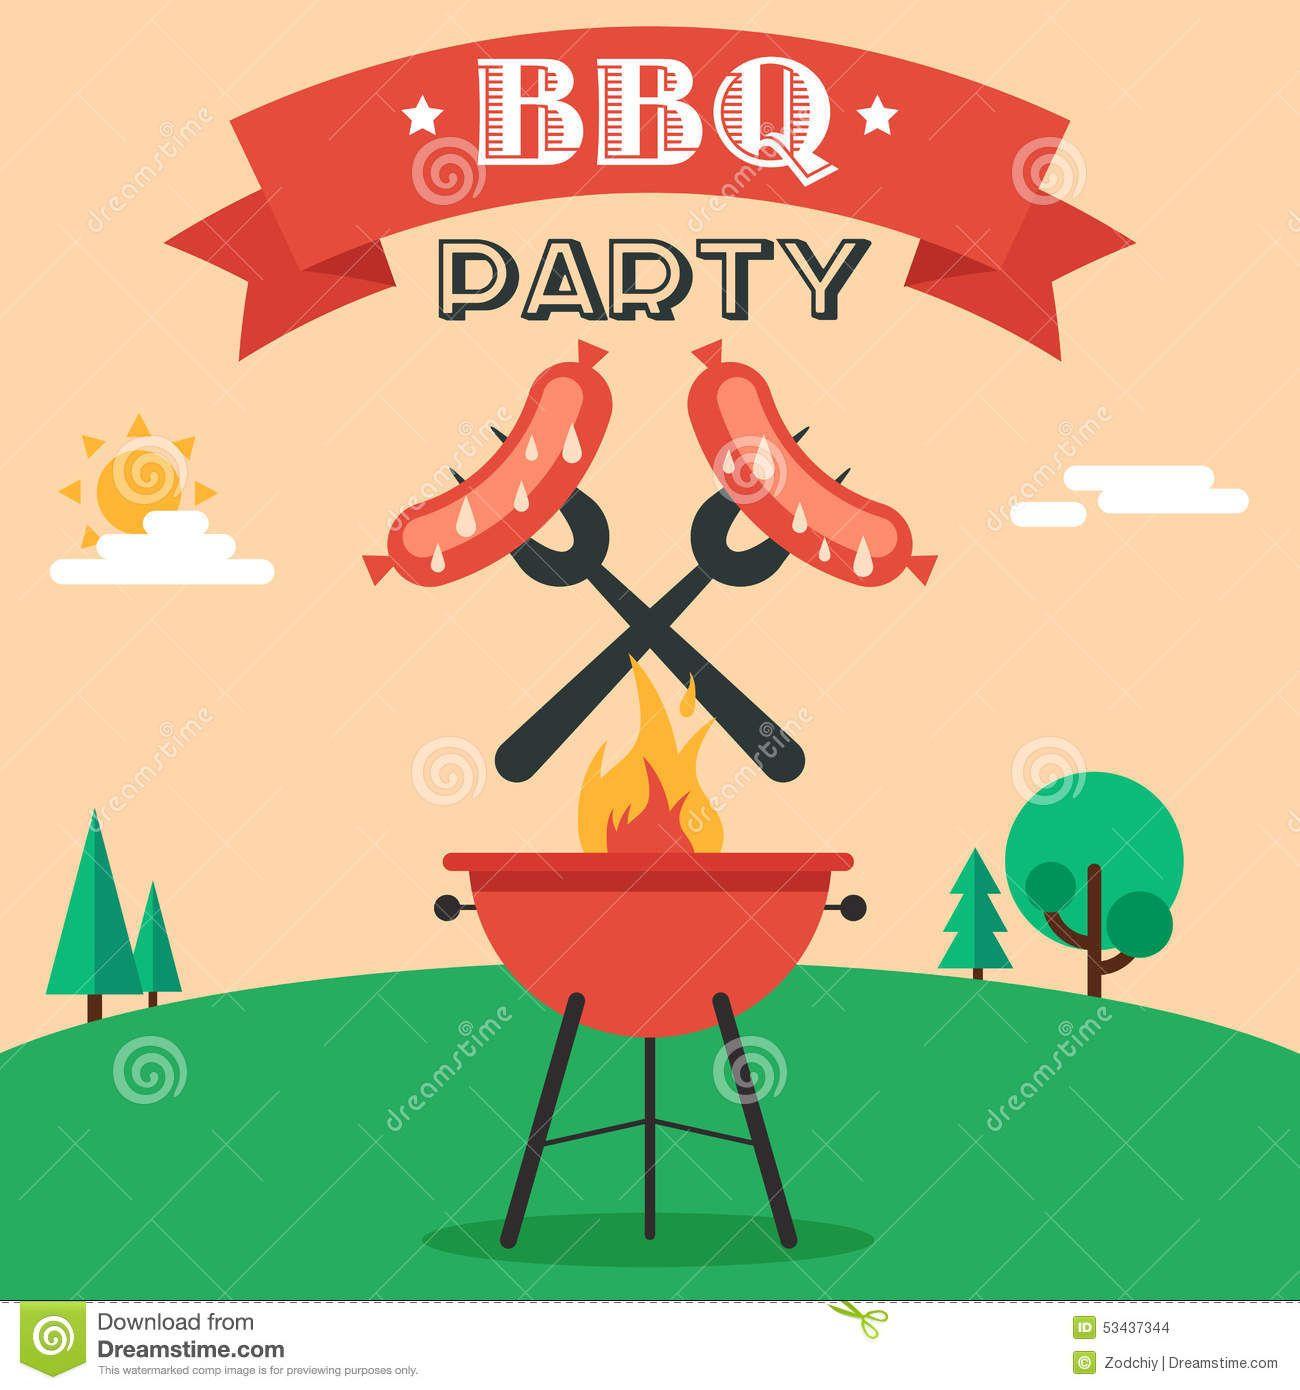 Barbecue clipart graduation. Bbq party invitations make